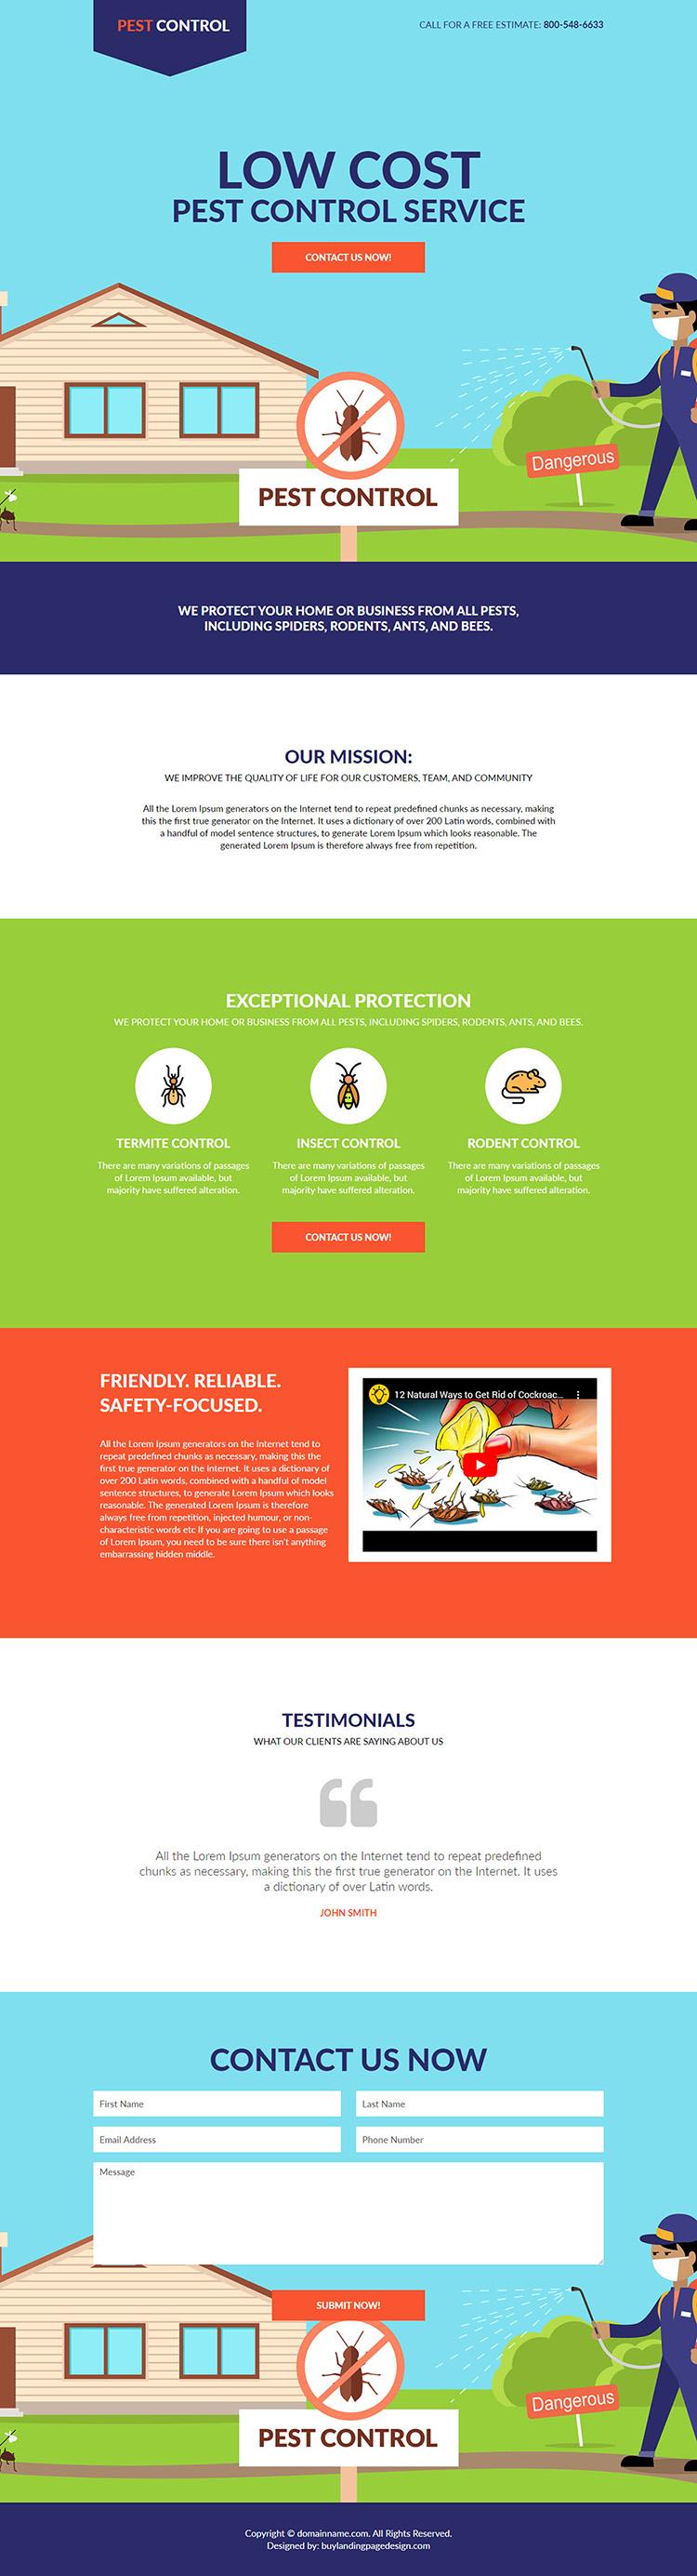 low cost pest control service responsive landing page design